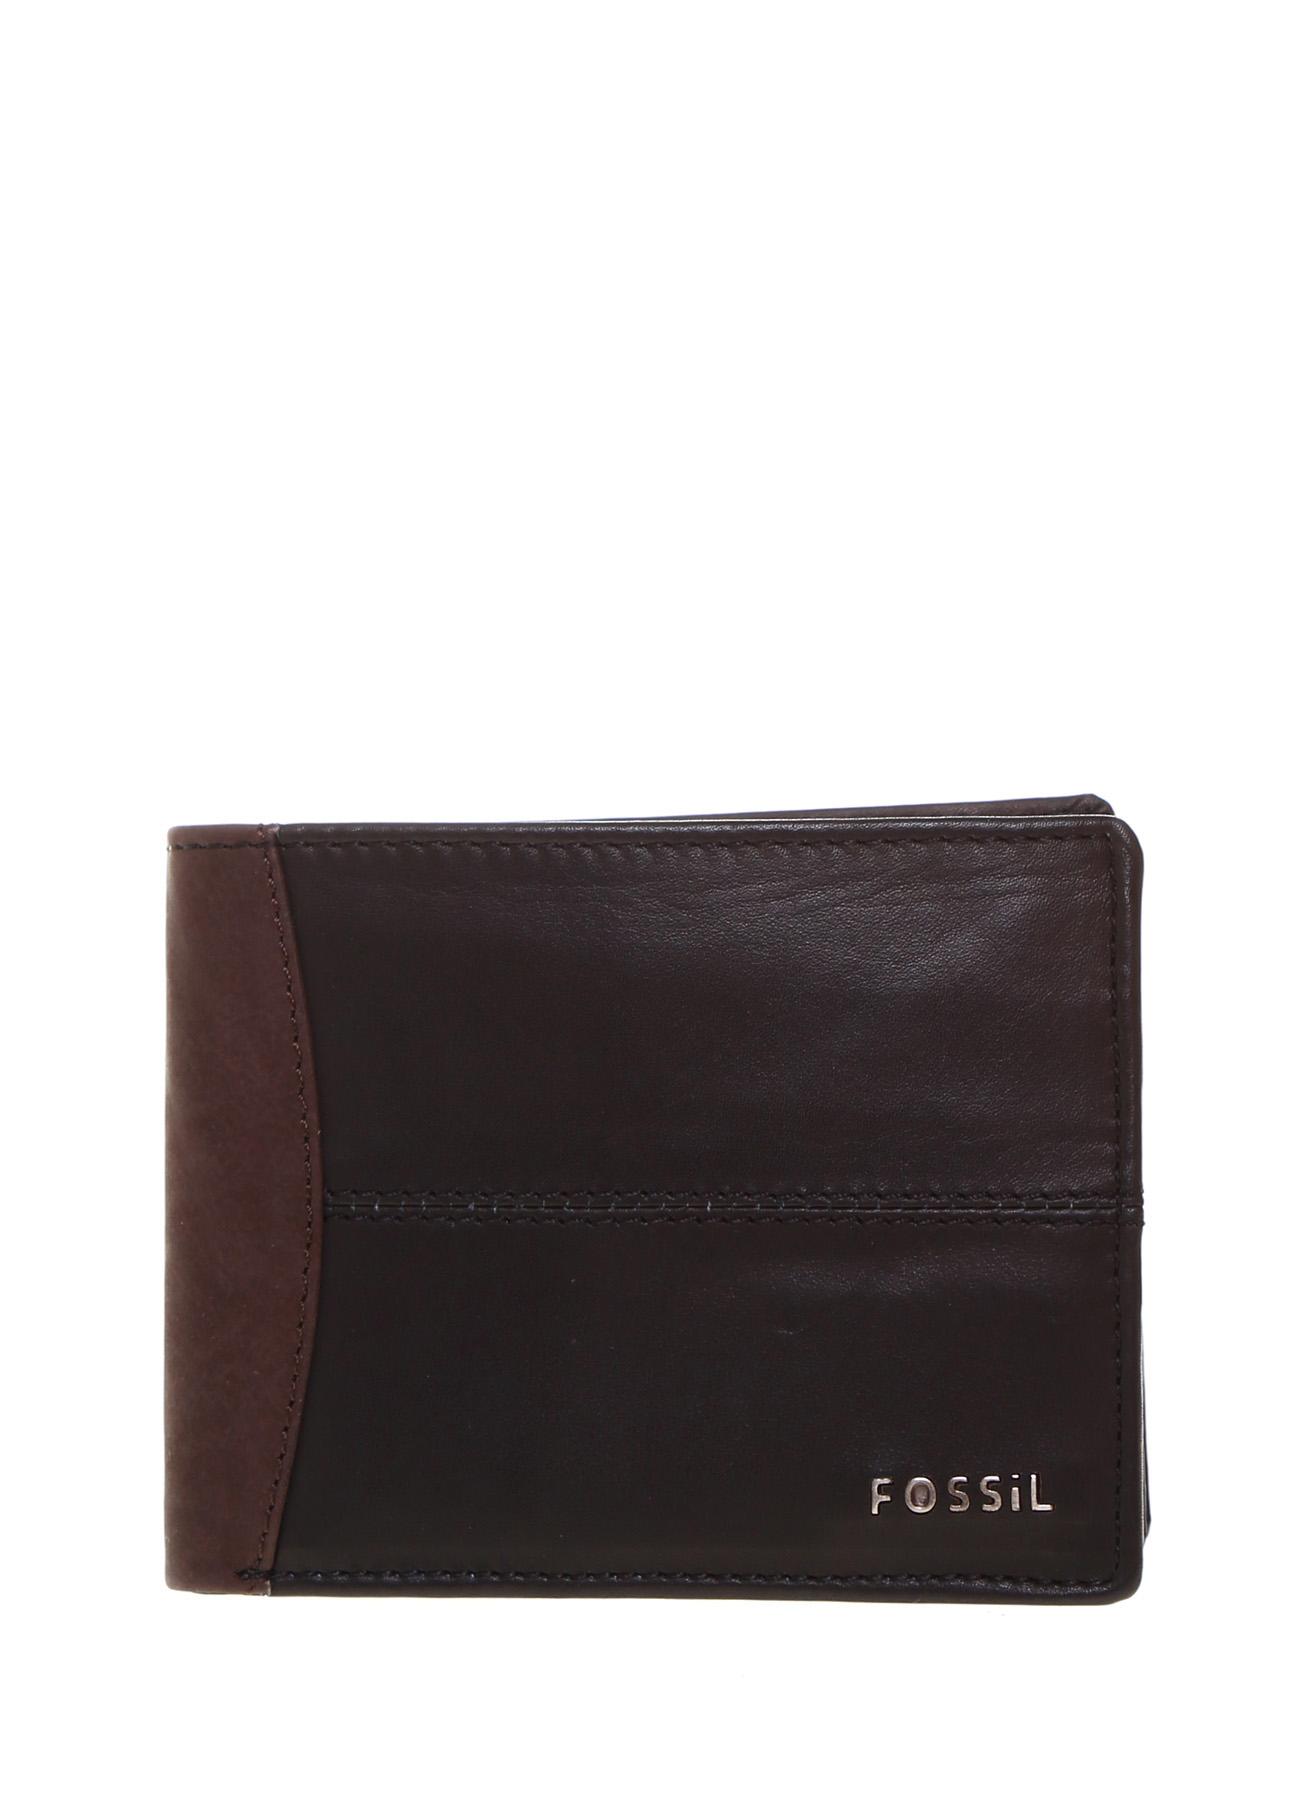 Fossil Siyah Cüzdan 5002341176001 Ürün Resmi